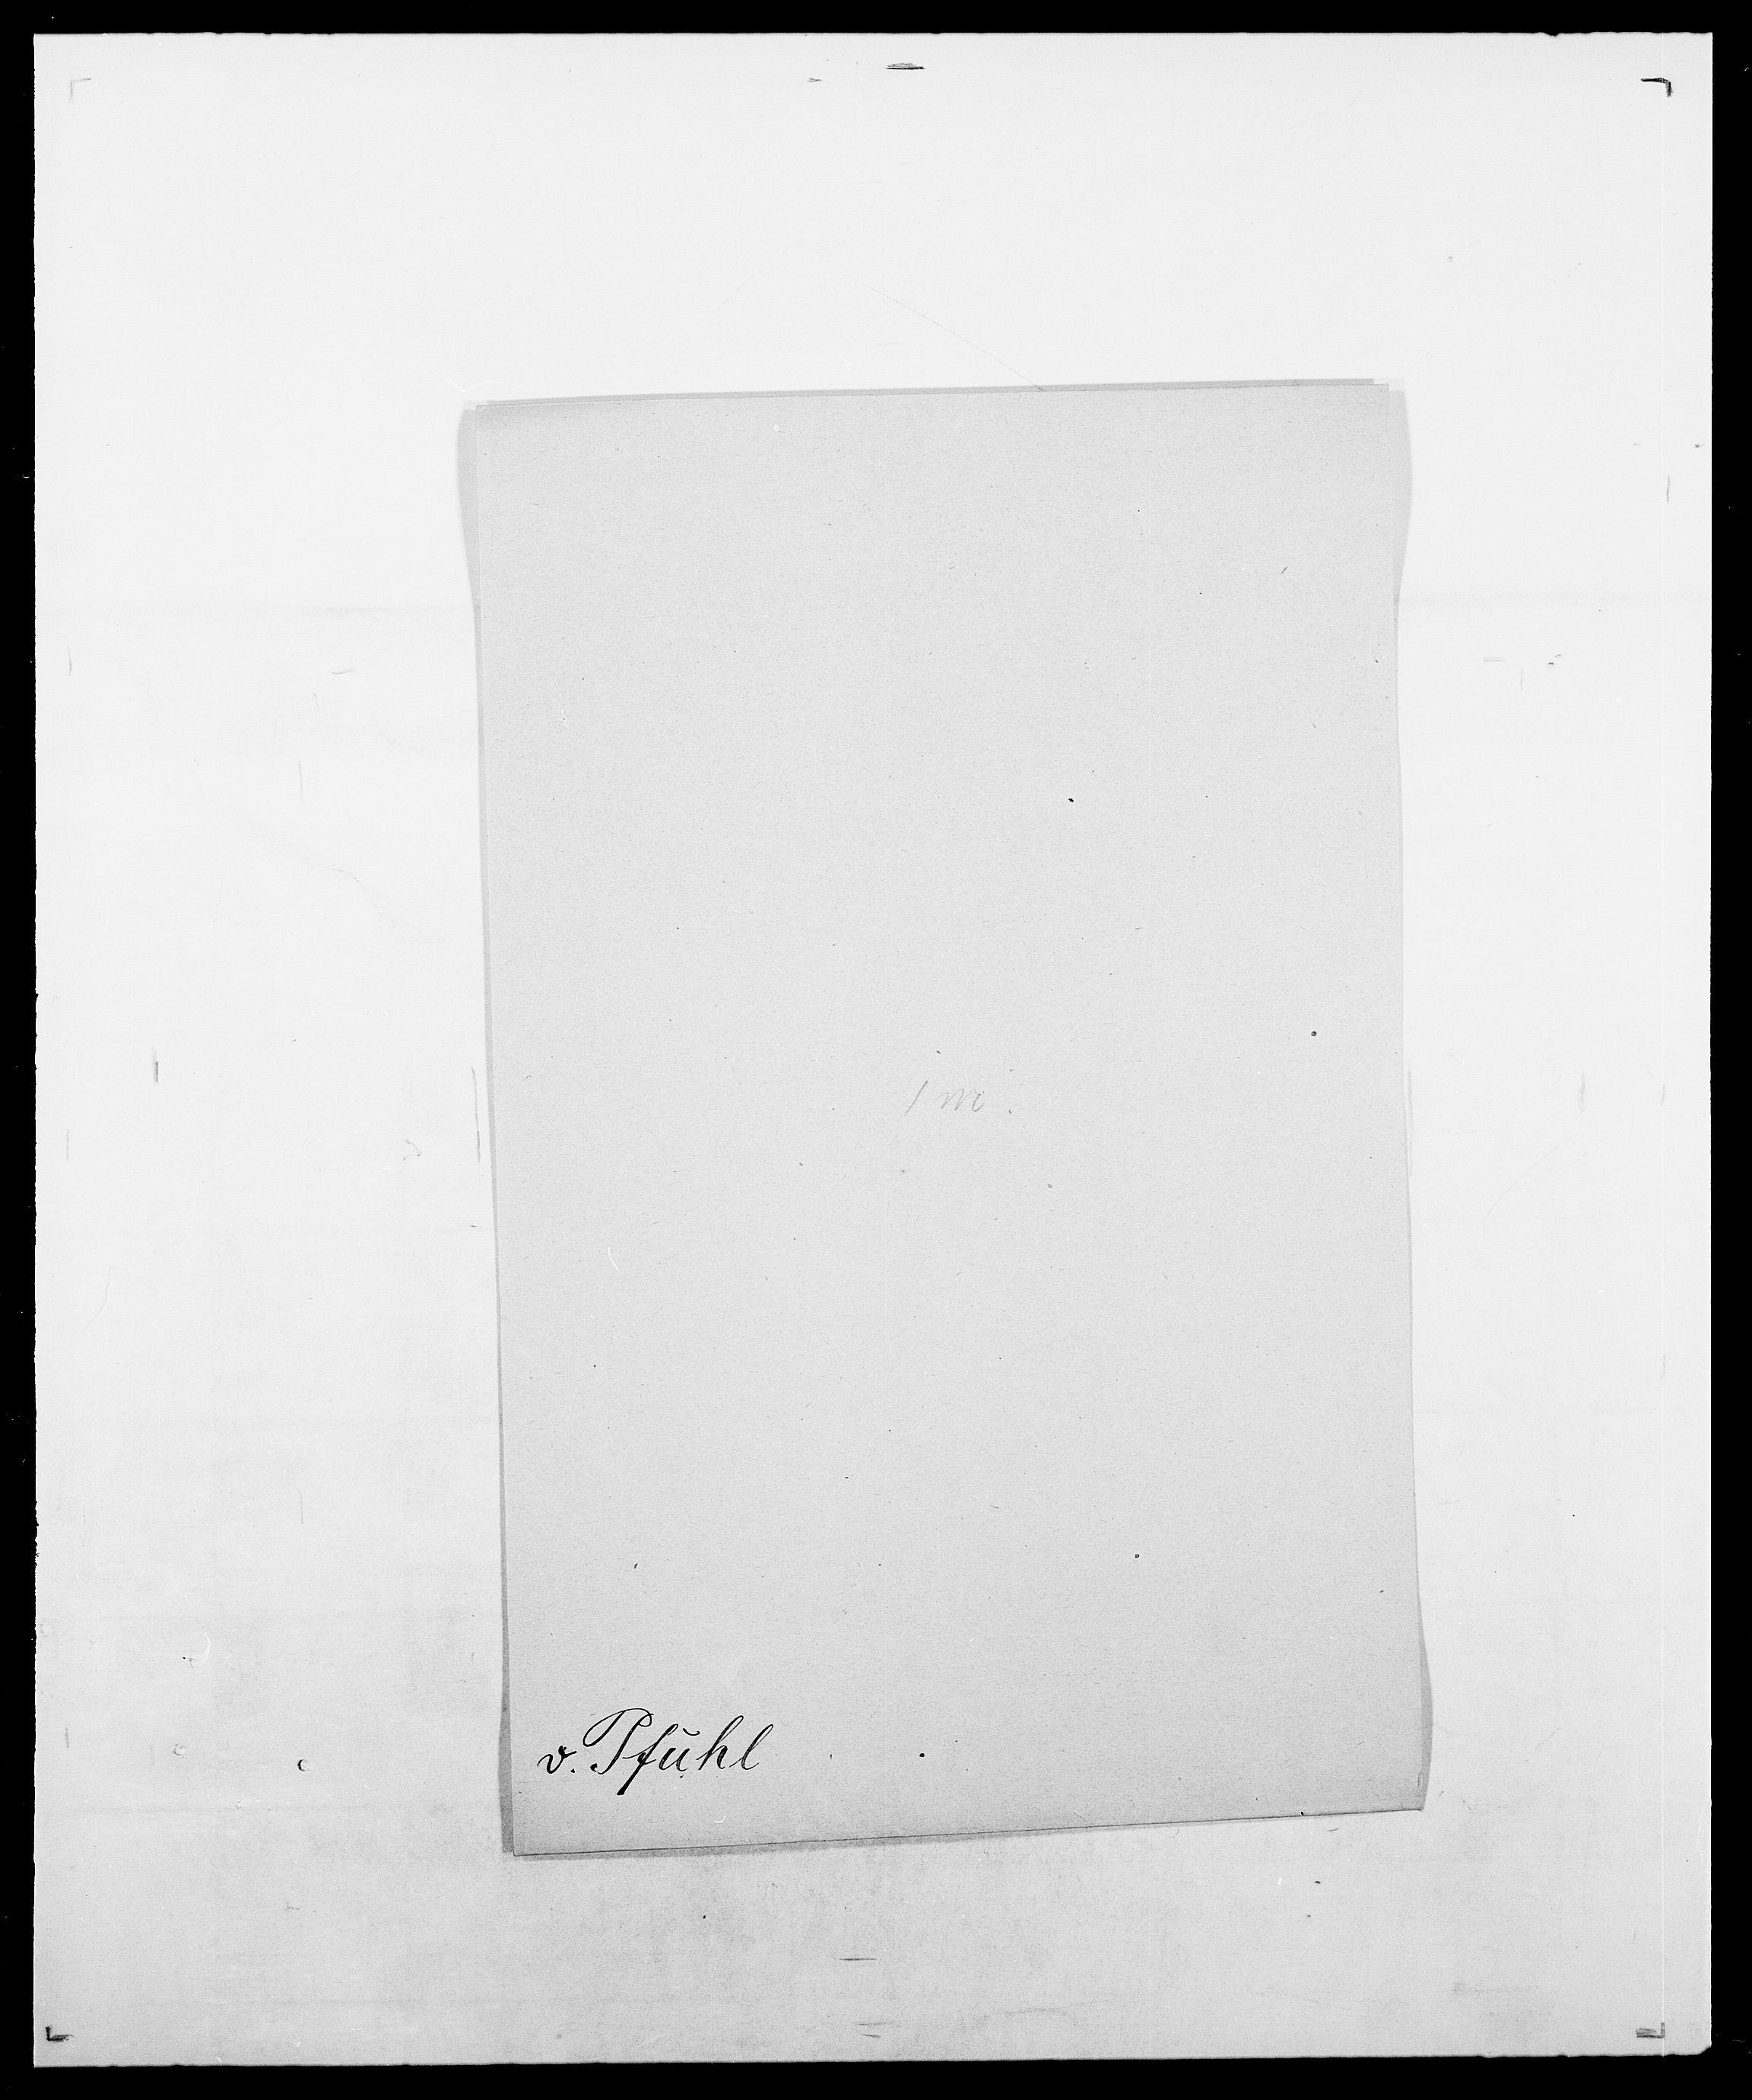 SAO, Delgobe, Charles Antoine - samling, D/Da/L0030: Paars - Pittelkov, s. 503